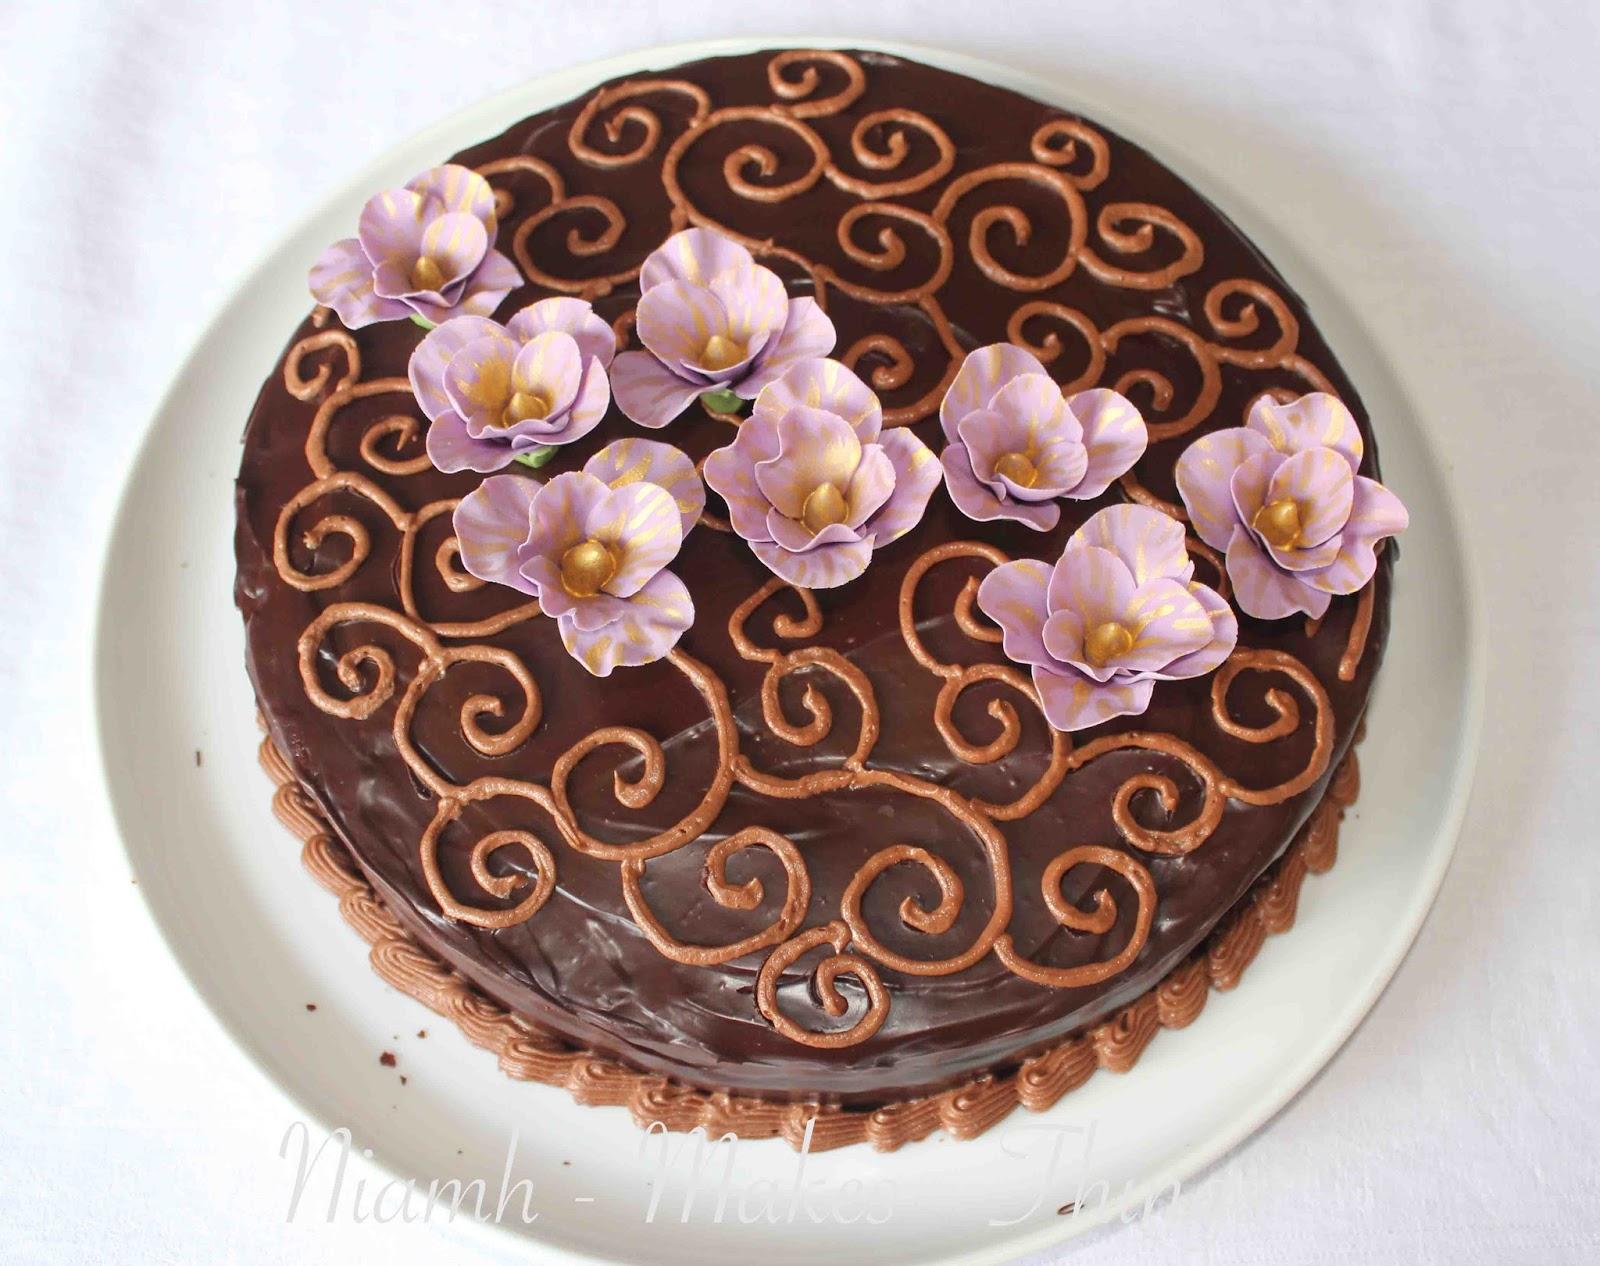 Chocolate Fudge Cake Decoration Ideas : Niamh-makes-things: Chocolate Fudge Cake